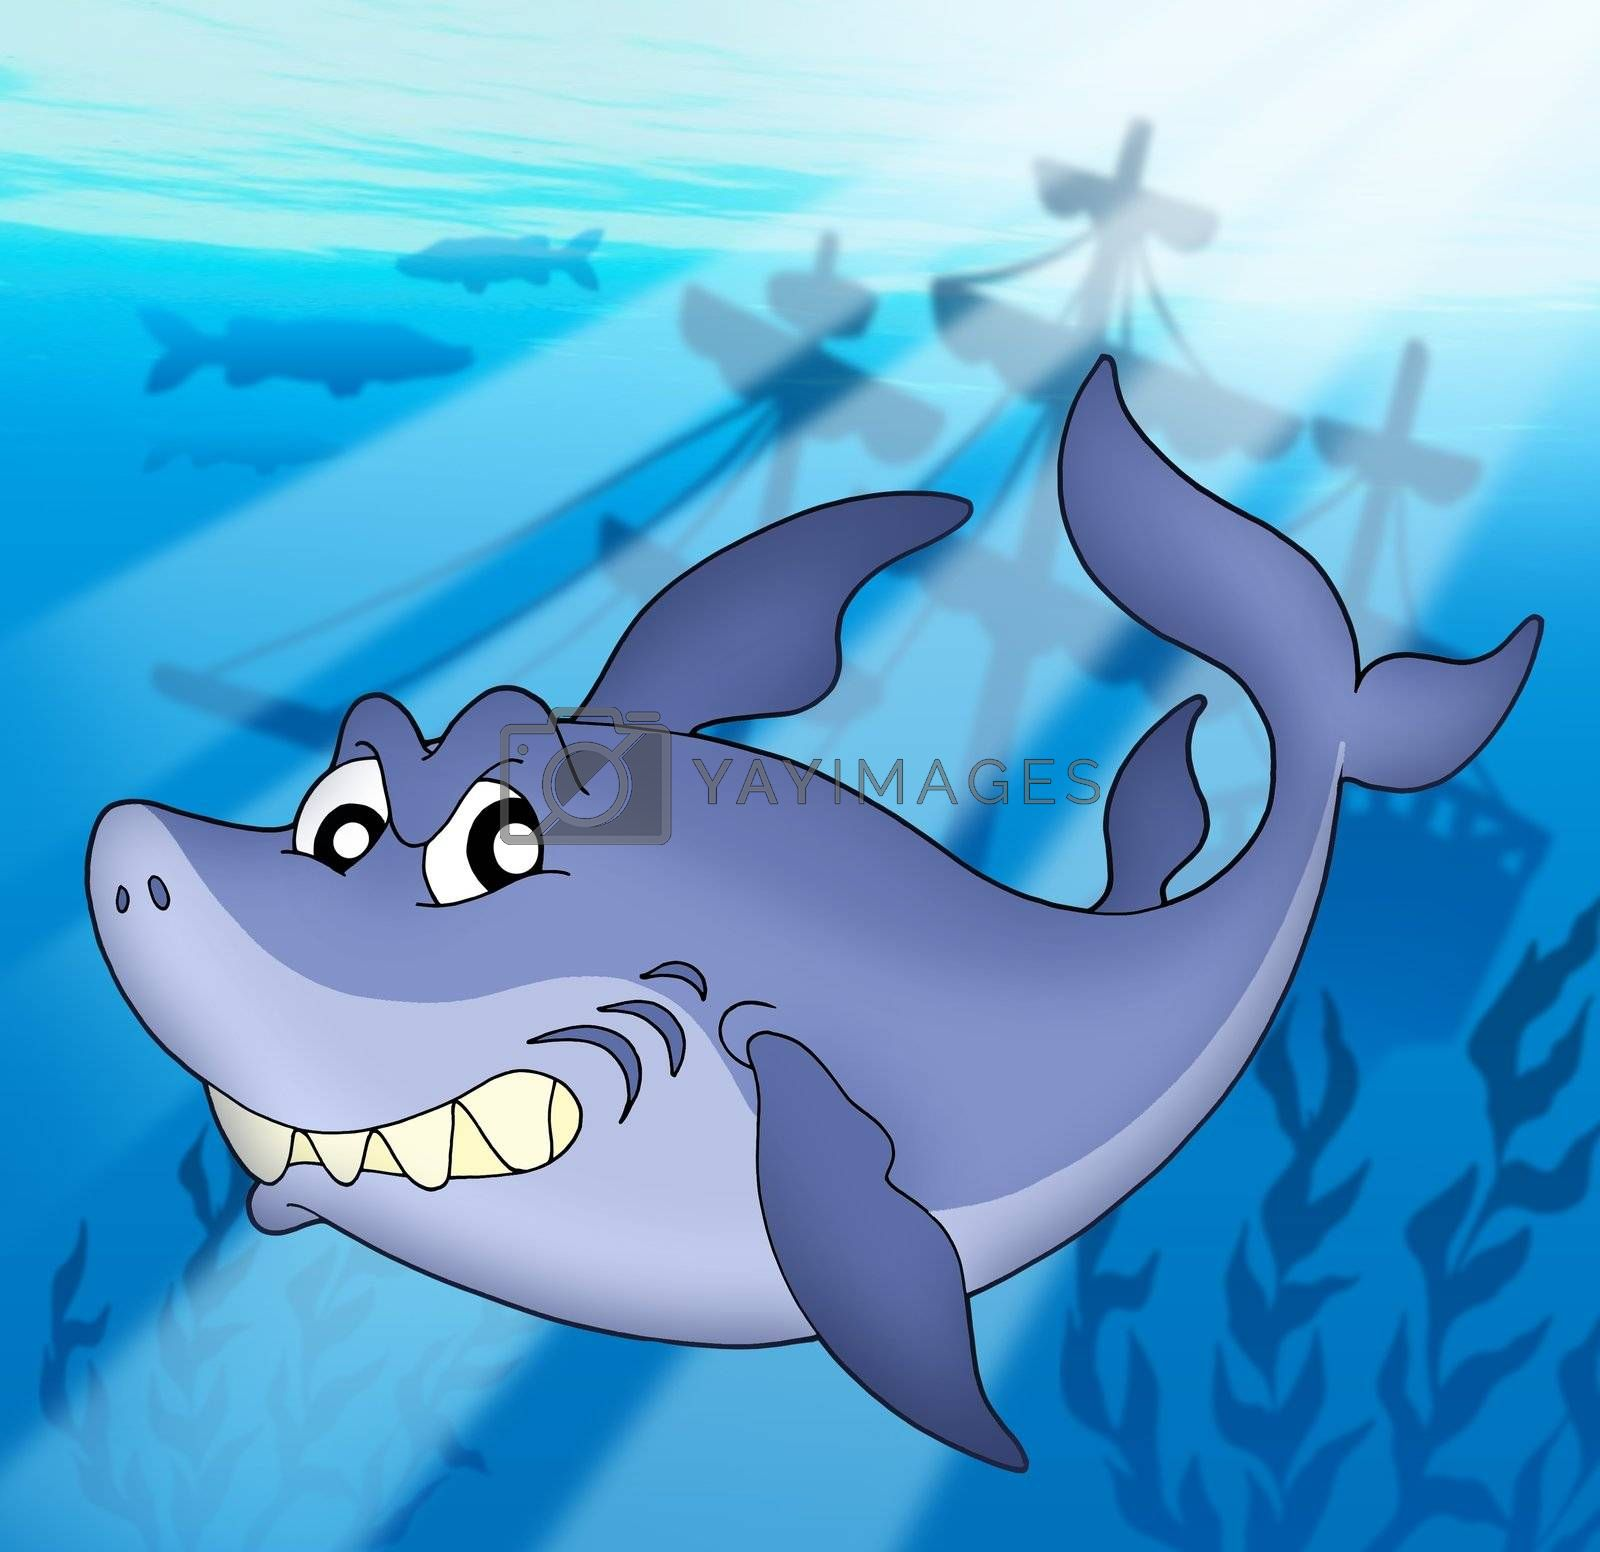 Shark with shipwreck - color illustration.